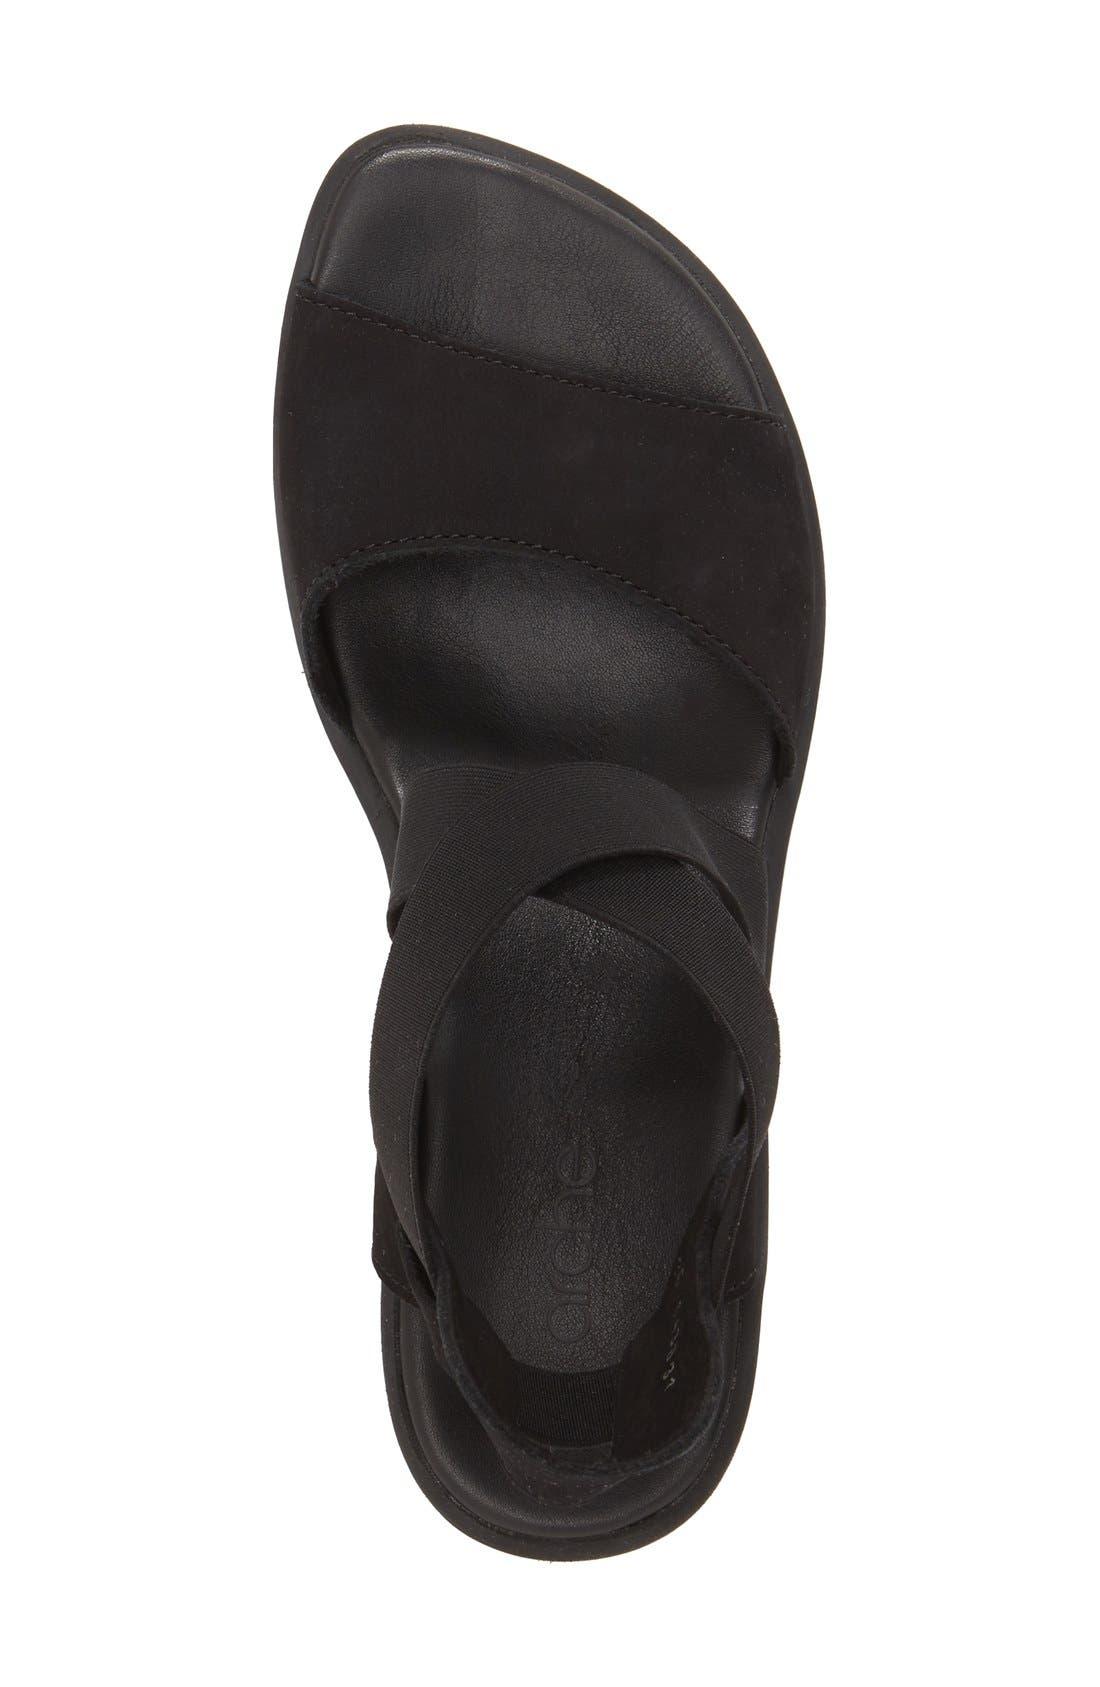 'Satia' Sandal,                             Alternate thumbnail 3, color,                             BLACK NUBUCK LEATHER